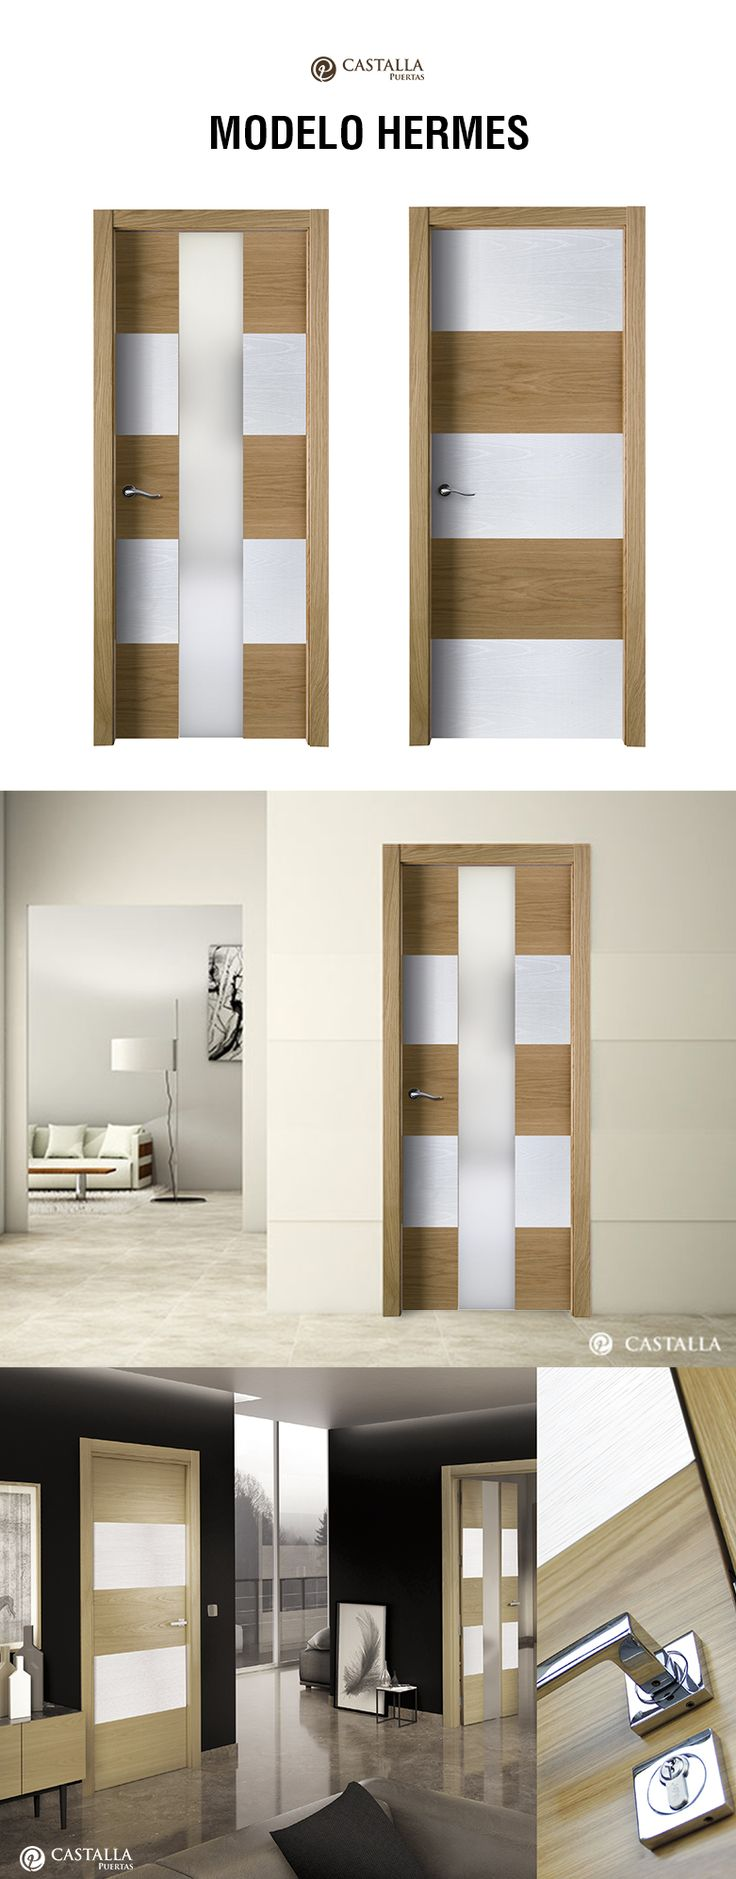 Puerta de interior con cristal Modelo HERMES. Puertas Castalla  Glass interior door model HERMES. Castalla Doors